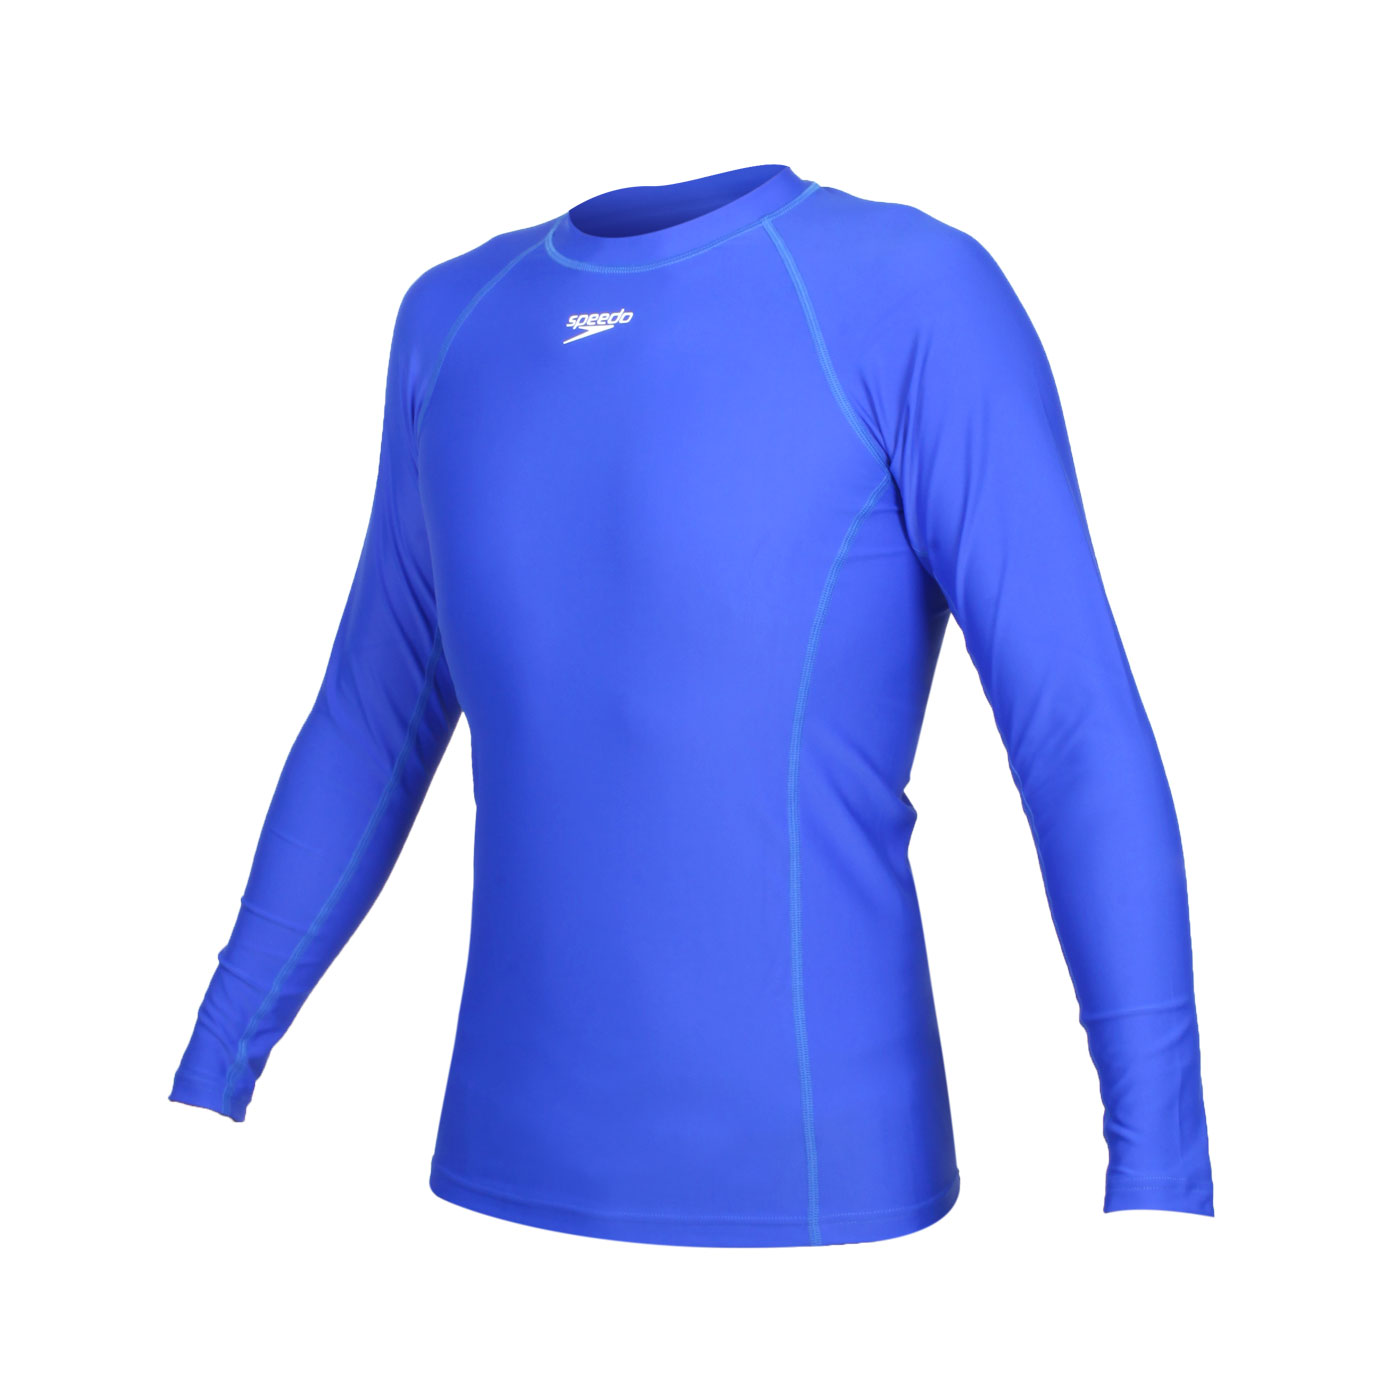 SPEEDO 男款長袖防曬衣 SD8132095135 - 藍白